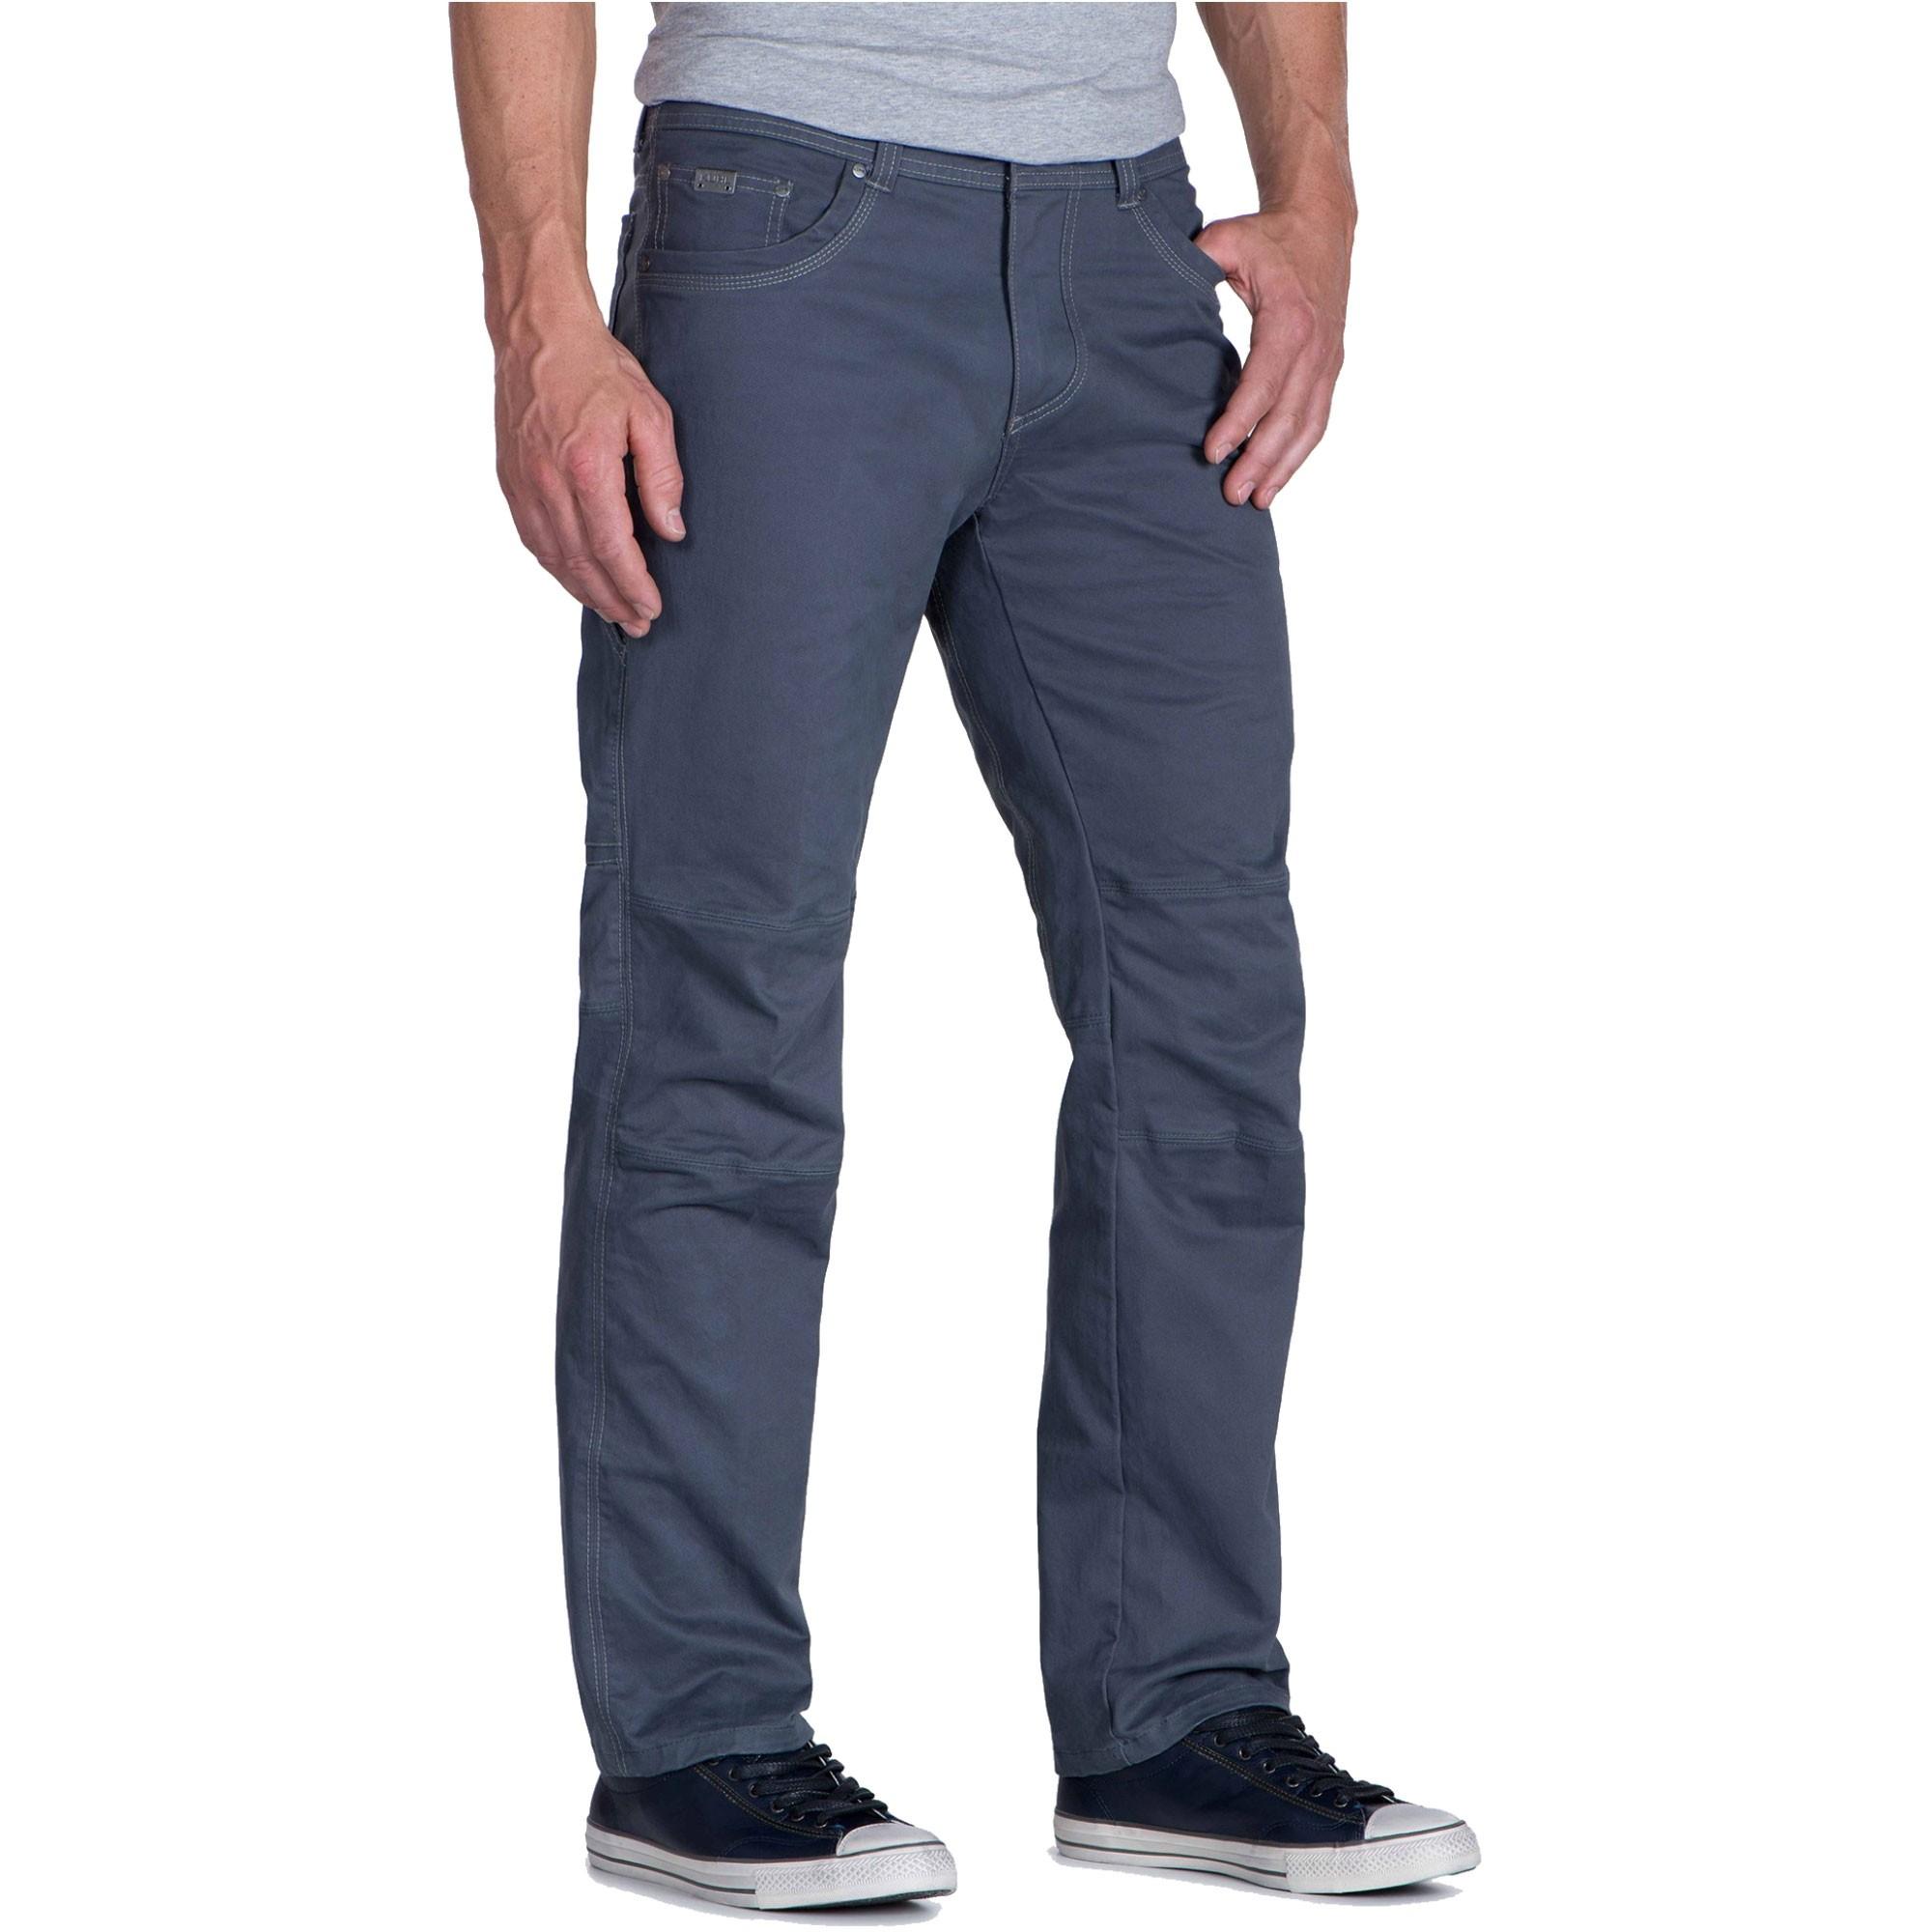 Kuhl Rebel Pants - Carbon